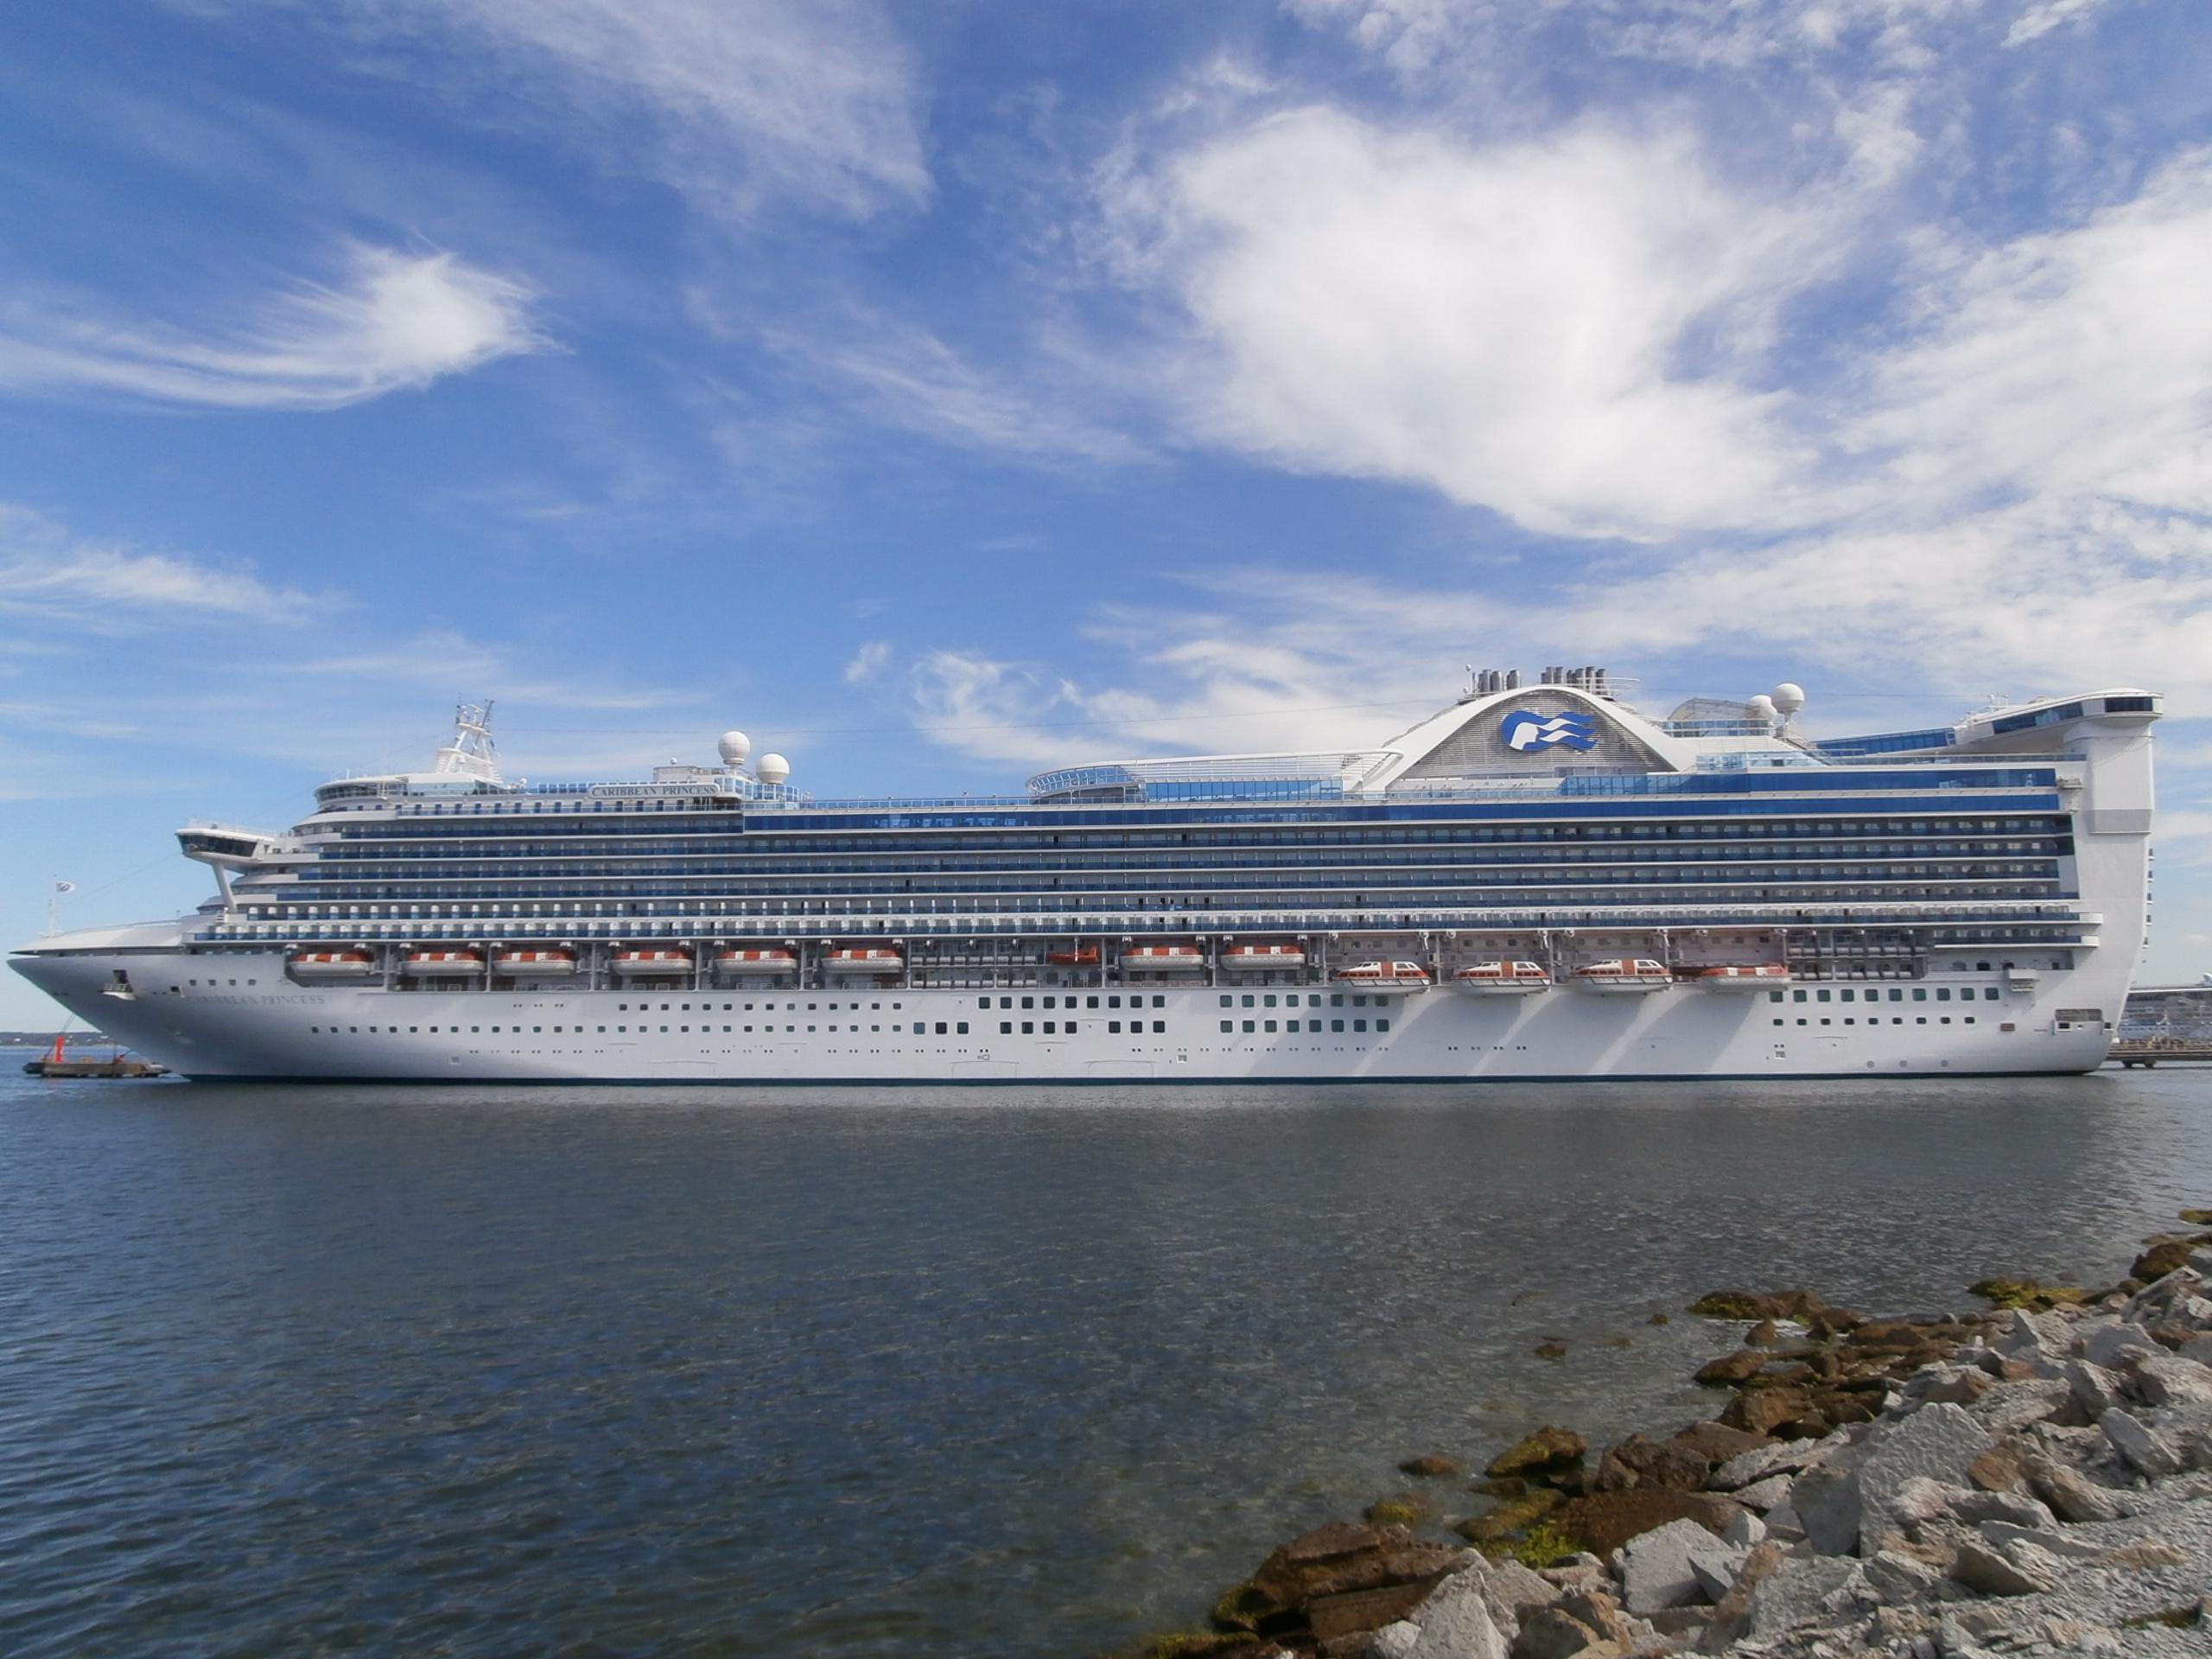 FileCaribbean Princess Port Side Tallinn 10 August